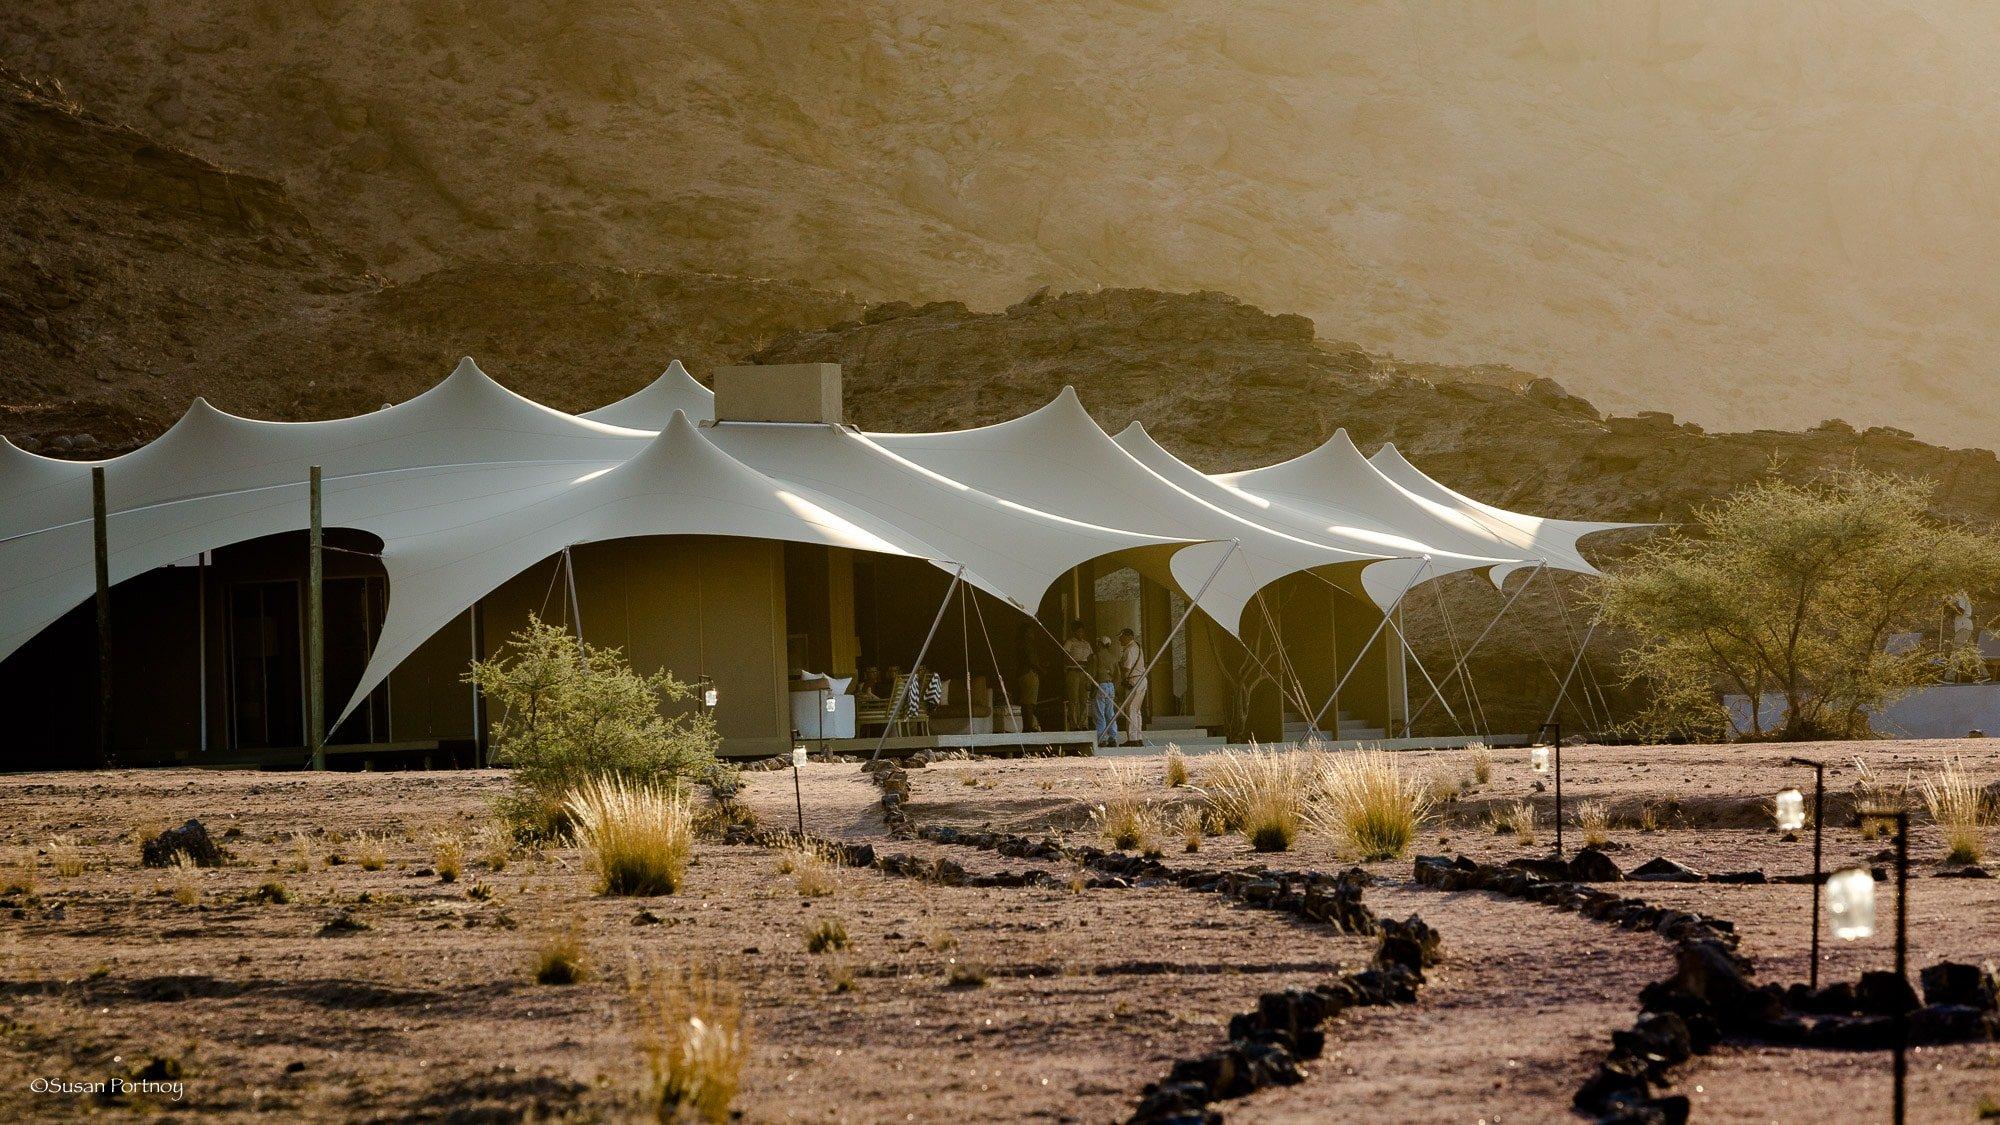 Main Tent at Haonib Skeleton Coast Camp, Namibia